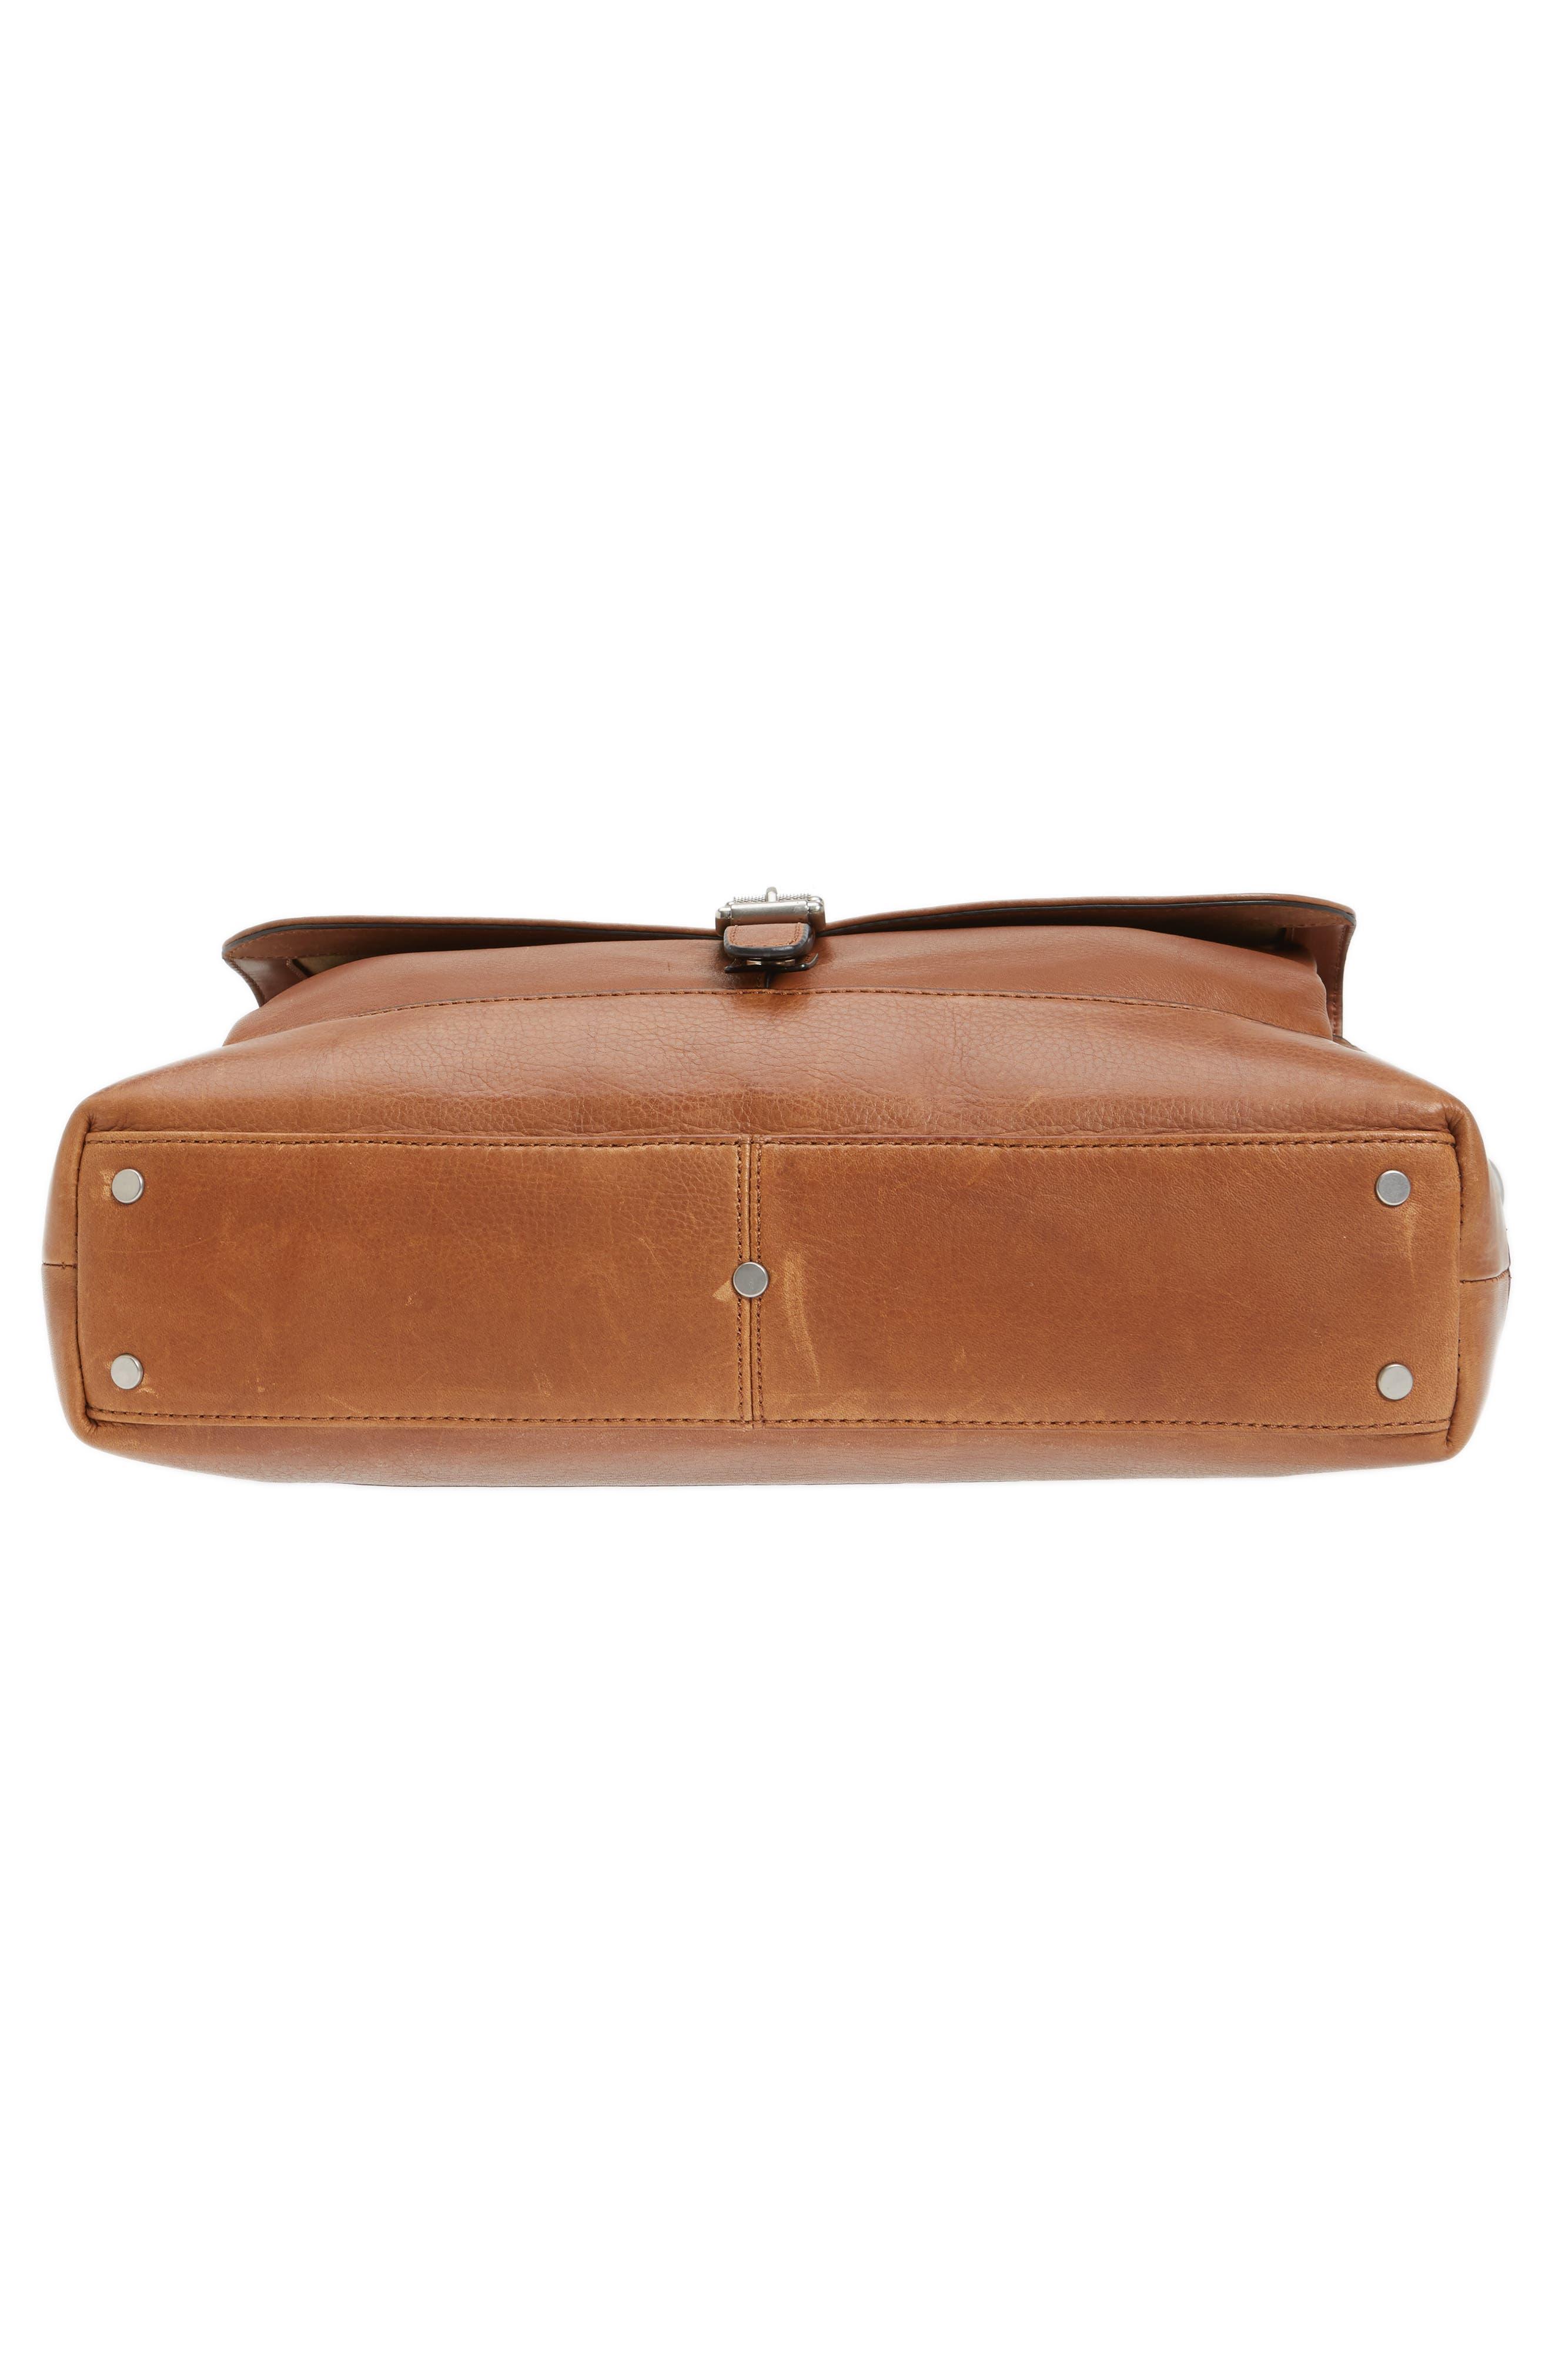 Oliver Leather Briefcase,                             Alternate thumbnail 6, color,                             Cognac